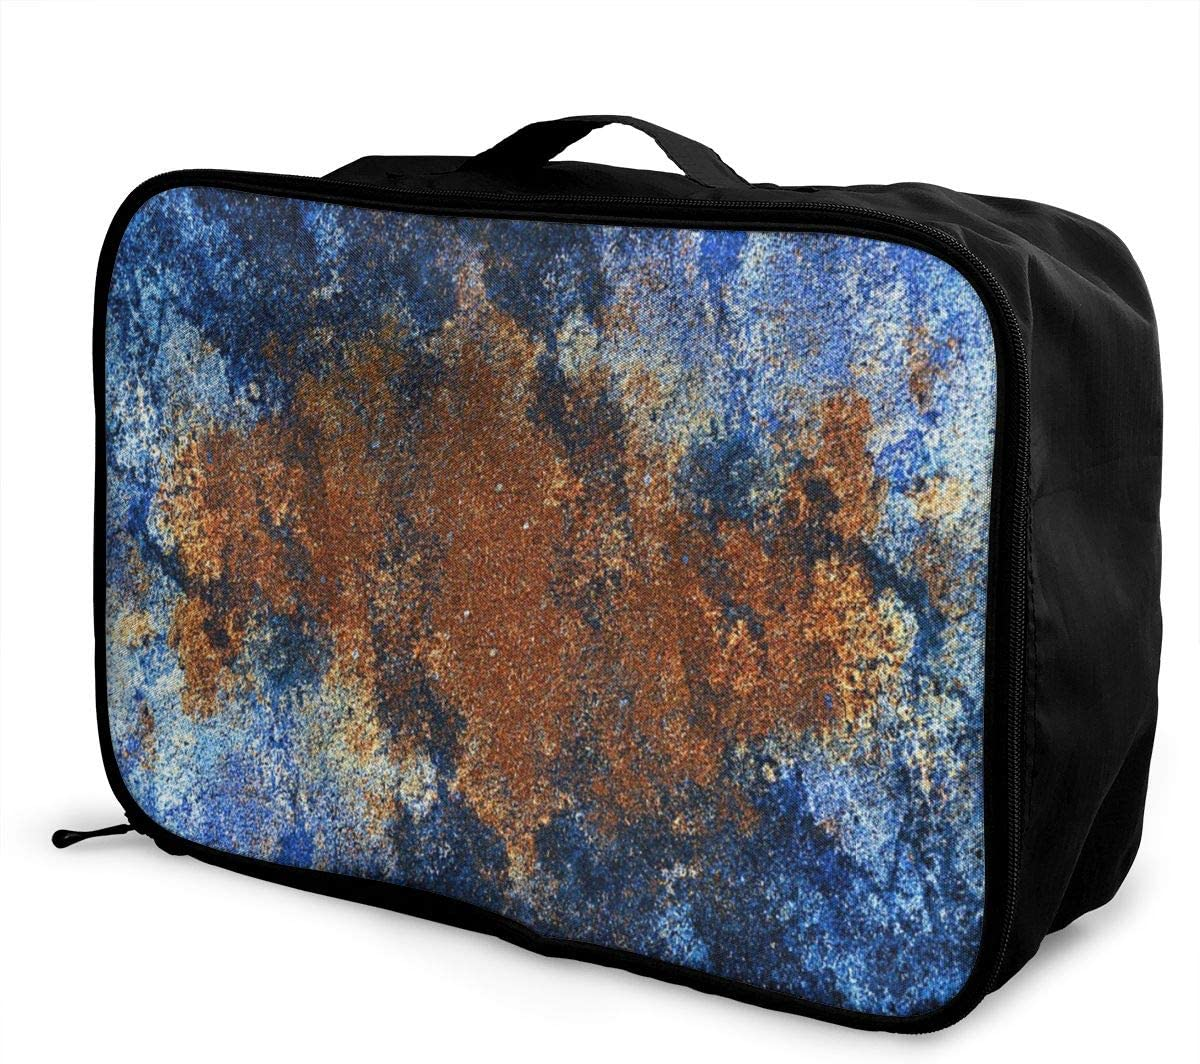 Yunshm Texture Blue Plaster Kaleidoscope Customized Trolley Handbag Waterproof Unisex Large Capacity For Business Travel Storage